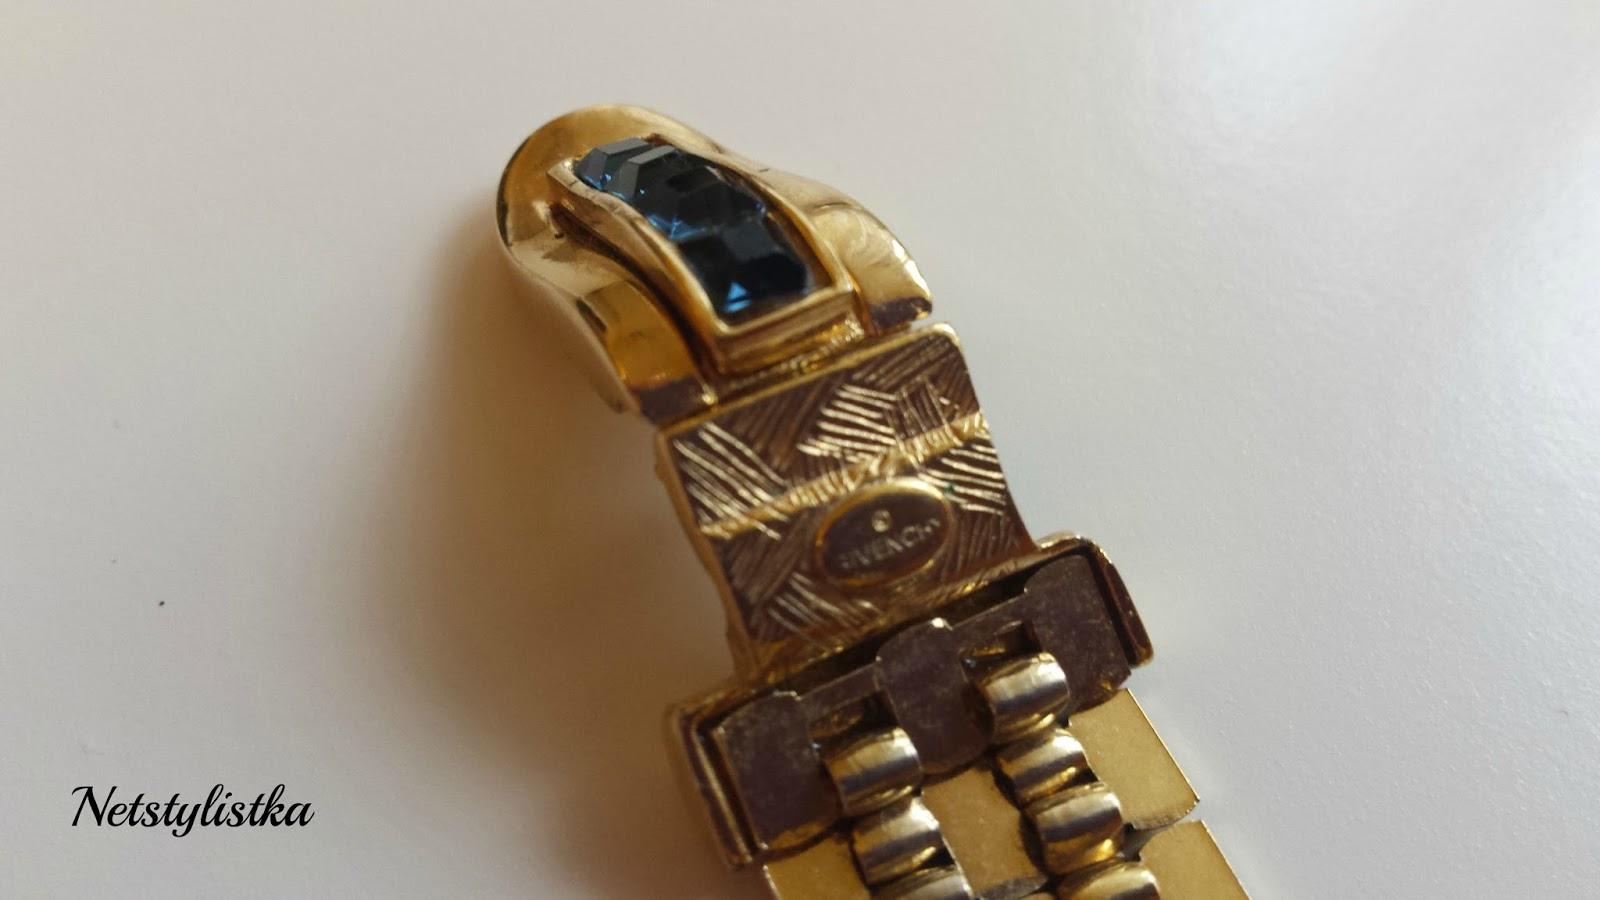 Givenchy biżuteria vintage złota bransoletka, vintage, stara biżuteria, biżuteria od projektantów